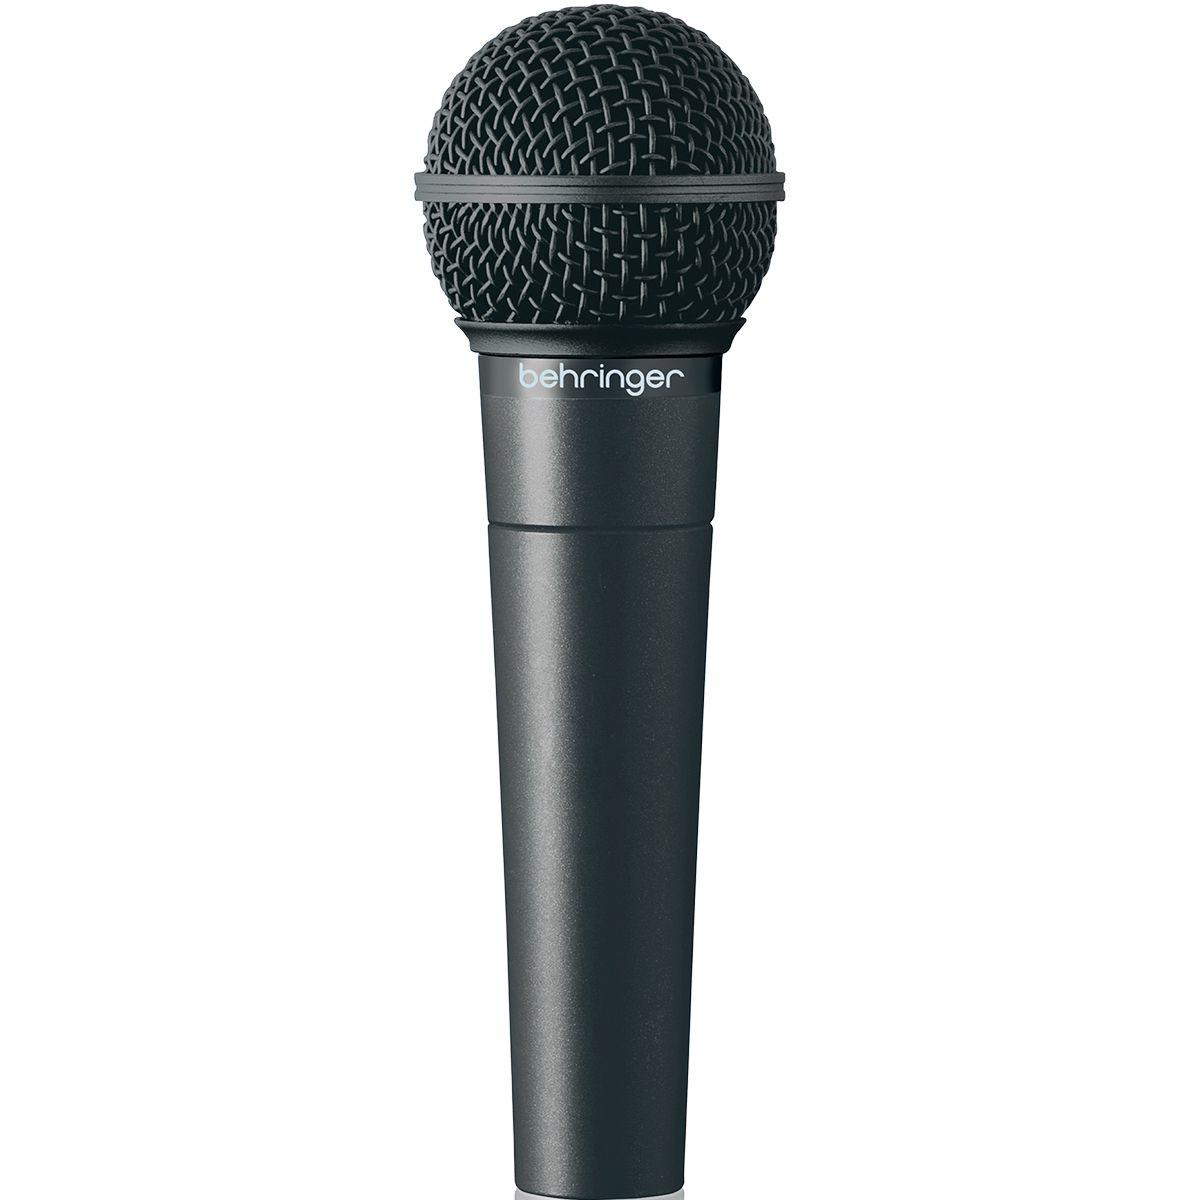 Microfone Behringer XM8500 Ultravoice